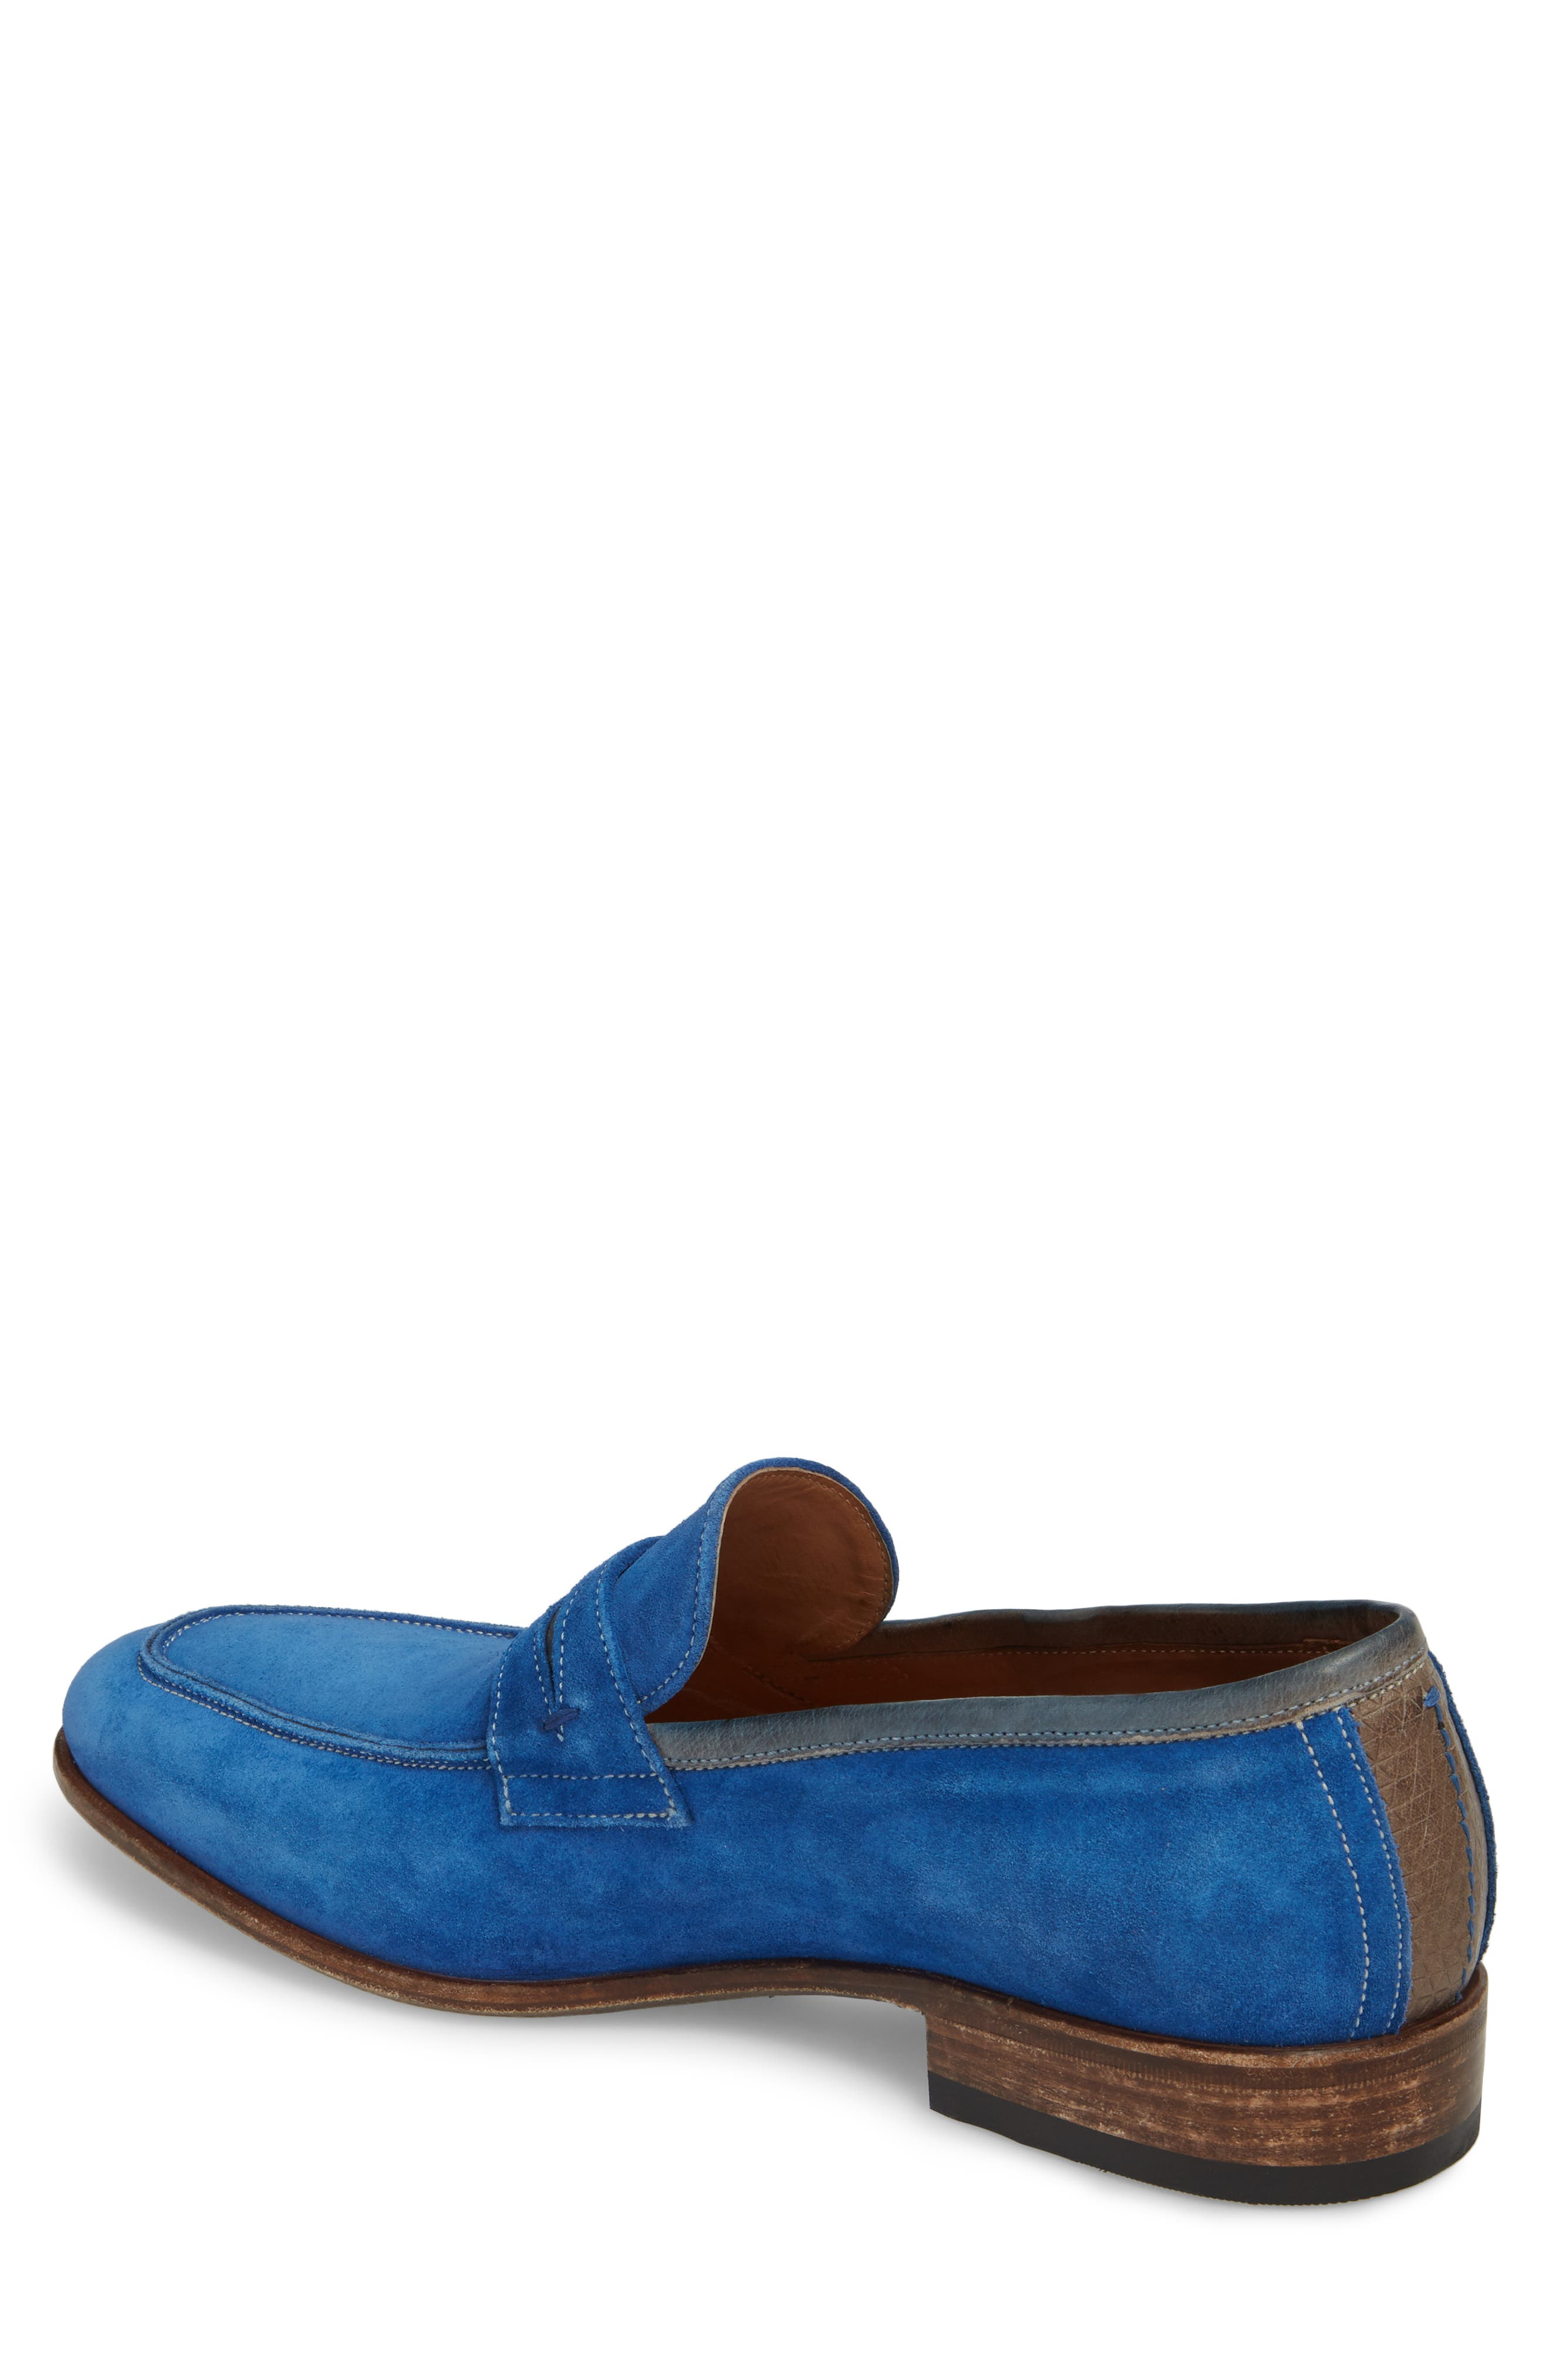 Lex Apron Toe Penny Loafer,                             Alternate thumbnail 2, color,                             Blue Suede